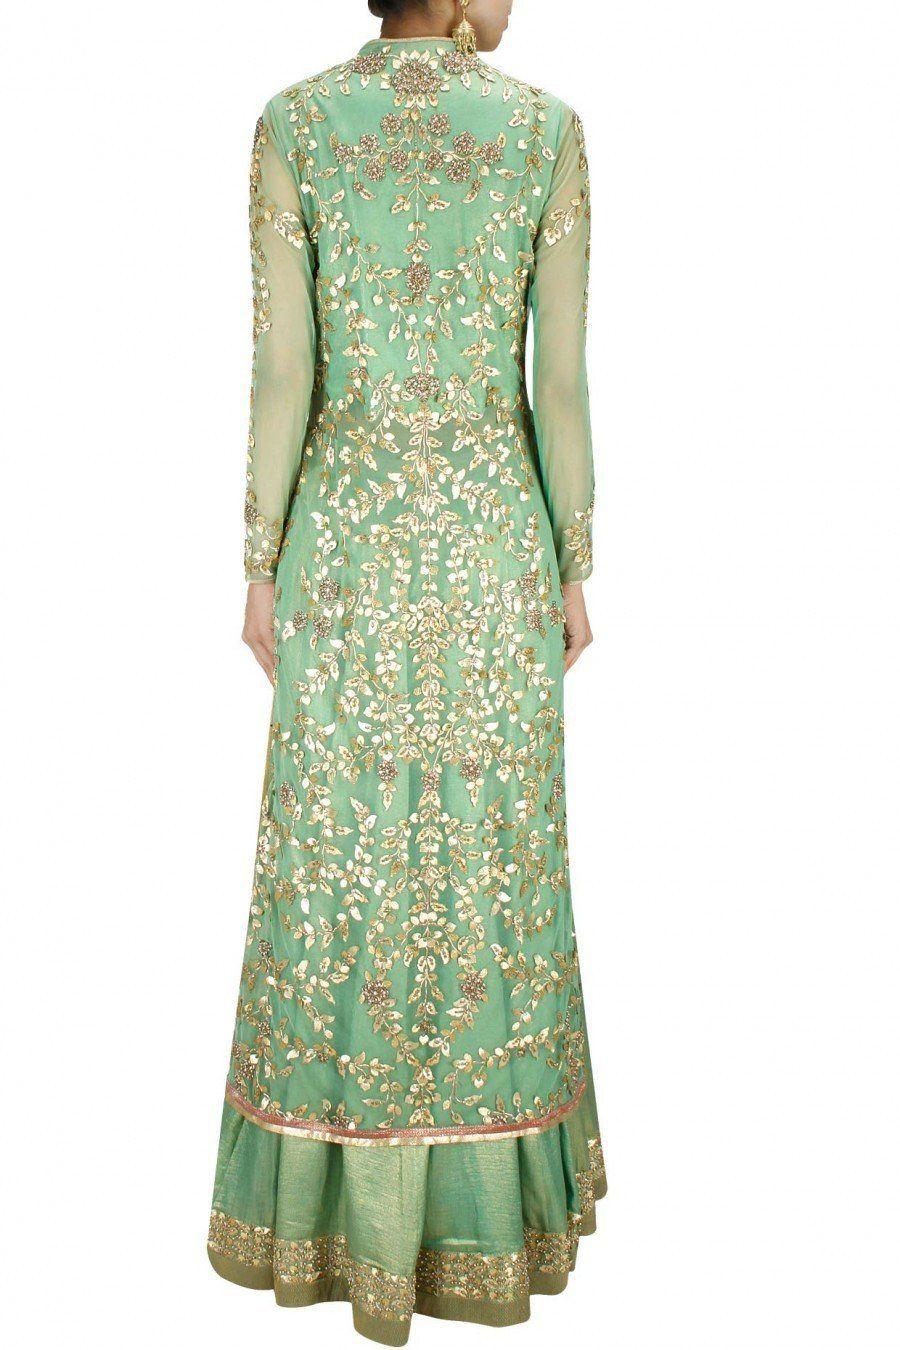 Green gota patti long jacket with foil lehenga and dupatta vintage